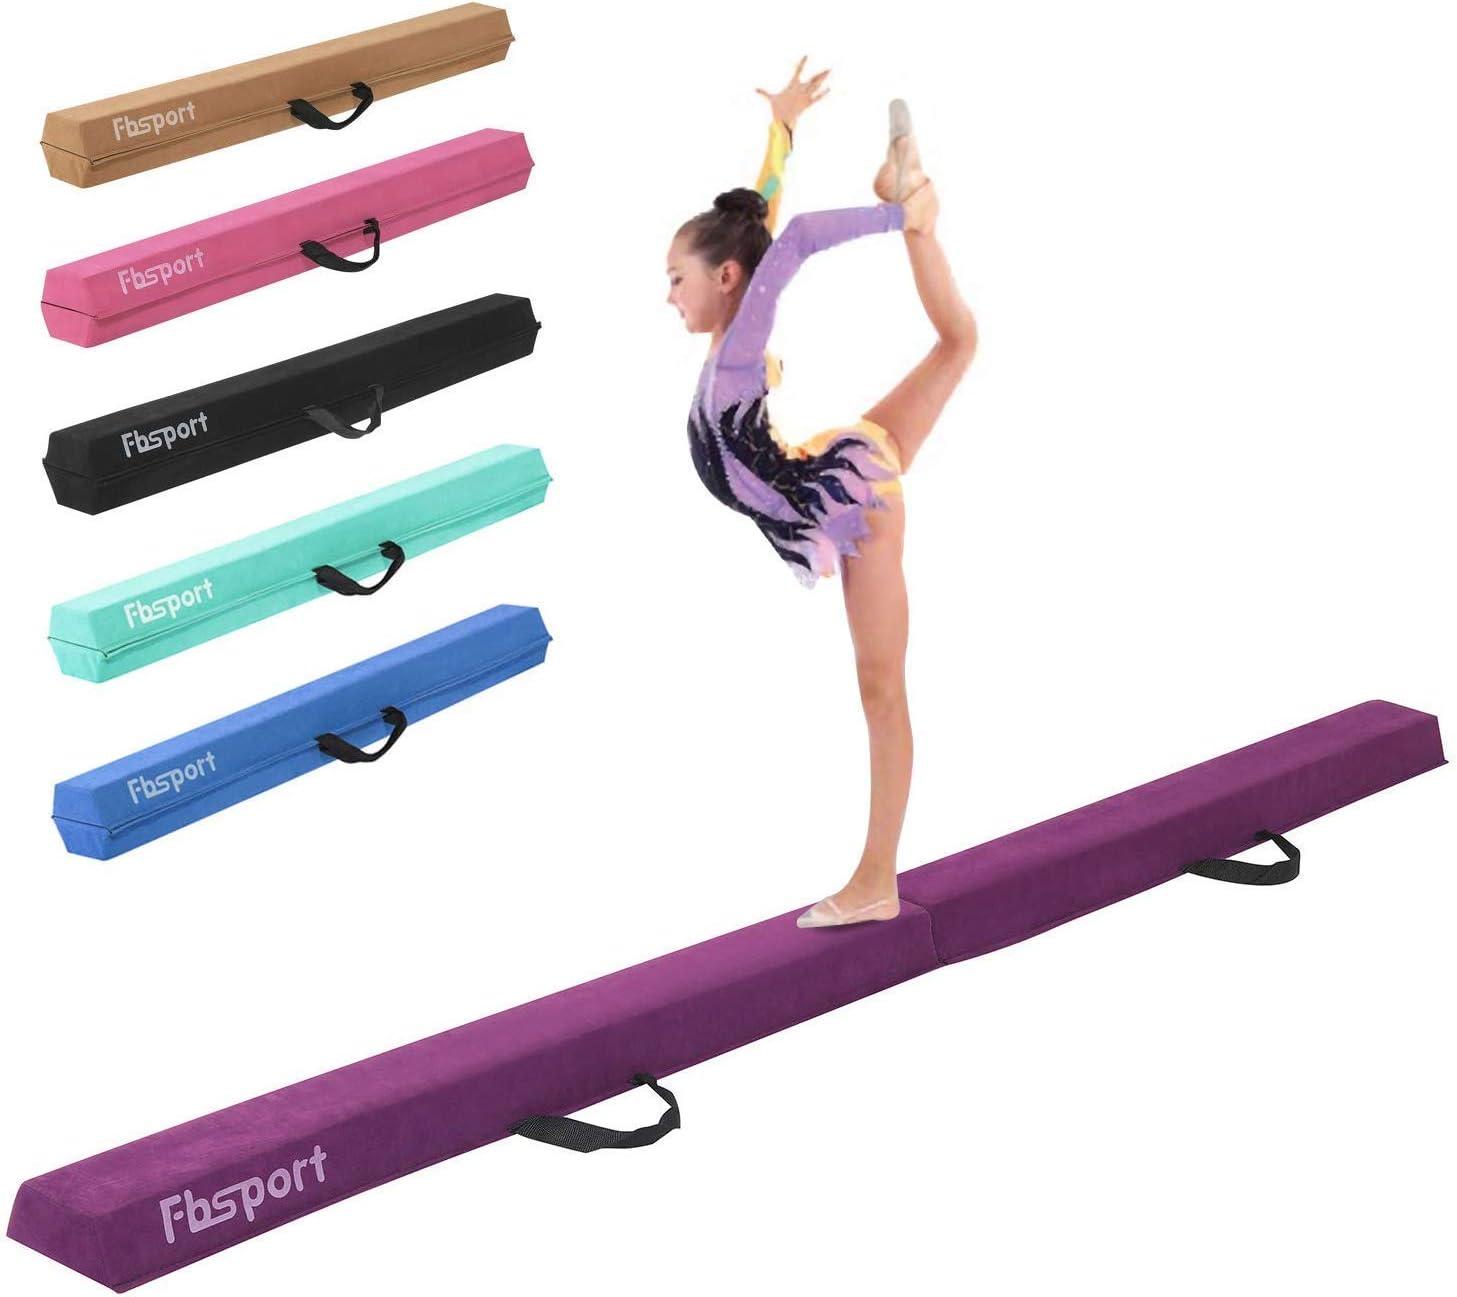 FBSPORT 8ft Balance Max 85% OFF Beam: Folding for Easy-to-use Equipment Floor Gymnastics